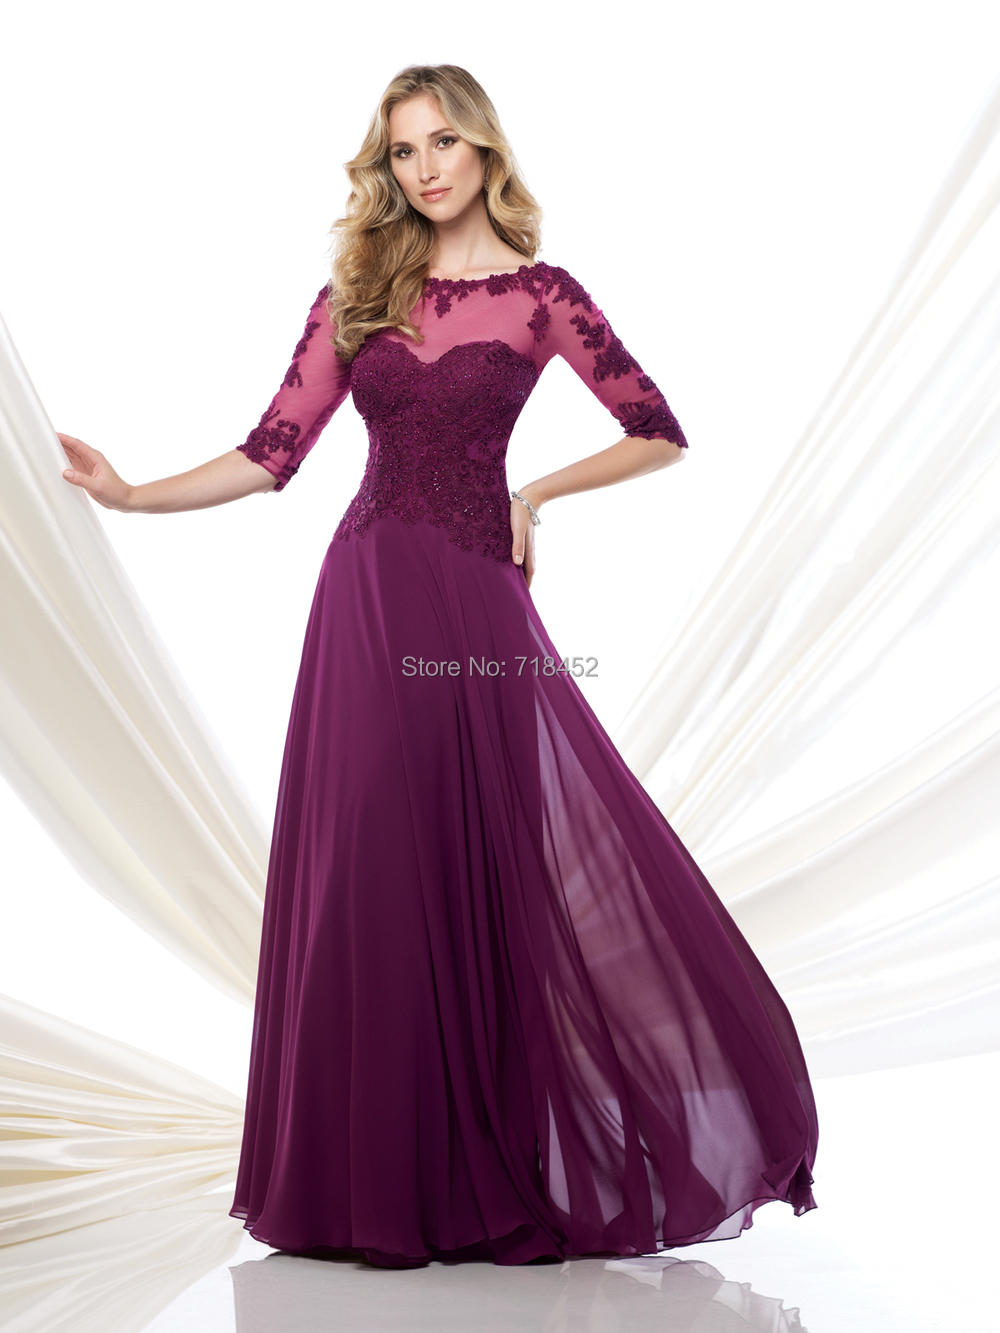 Sheer Sleeve Appliques 2015 Mutter der Braut Kleider Fushia Chiffon ...